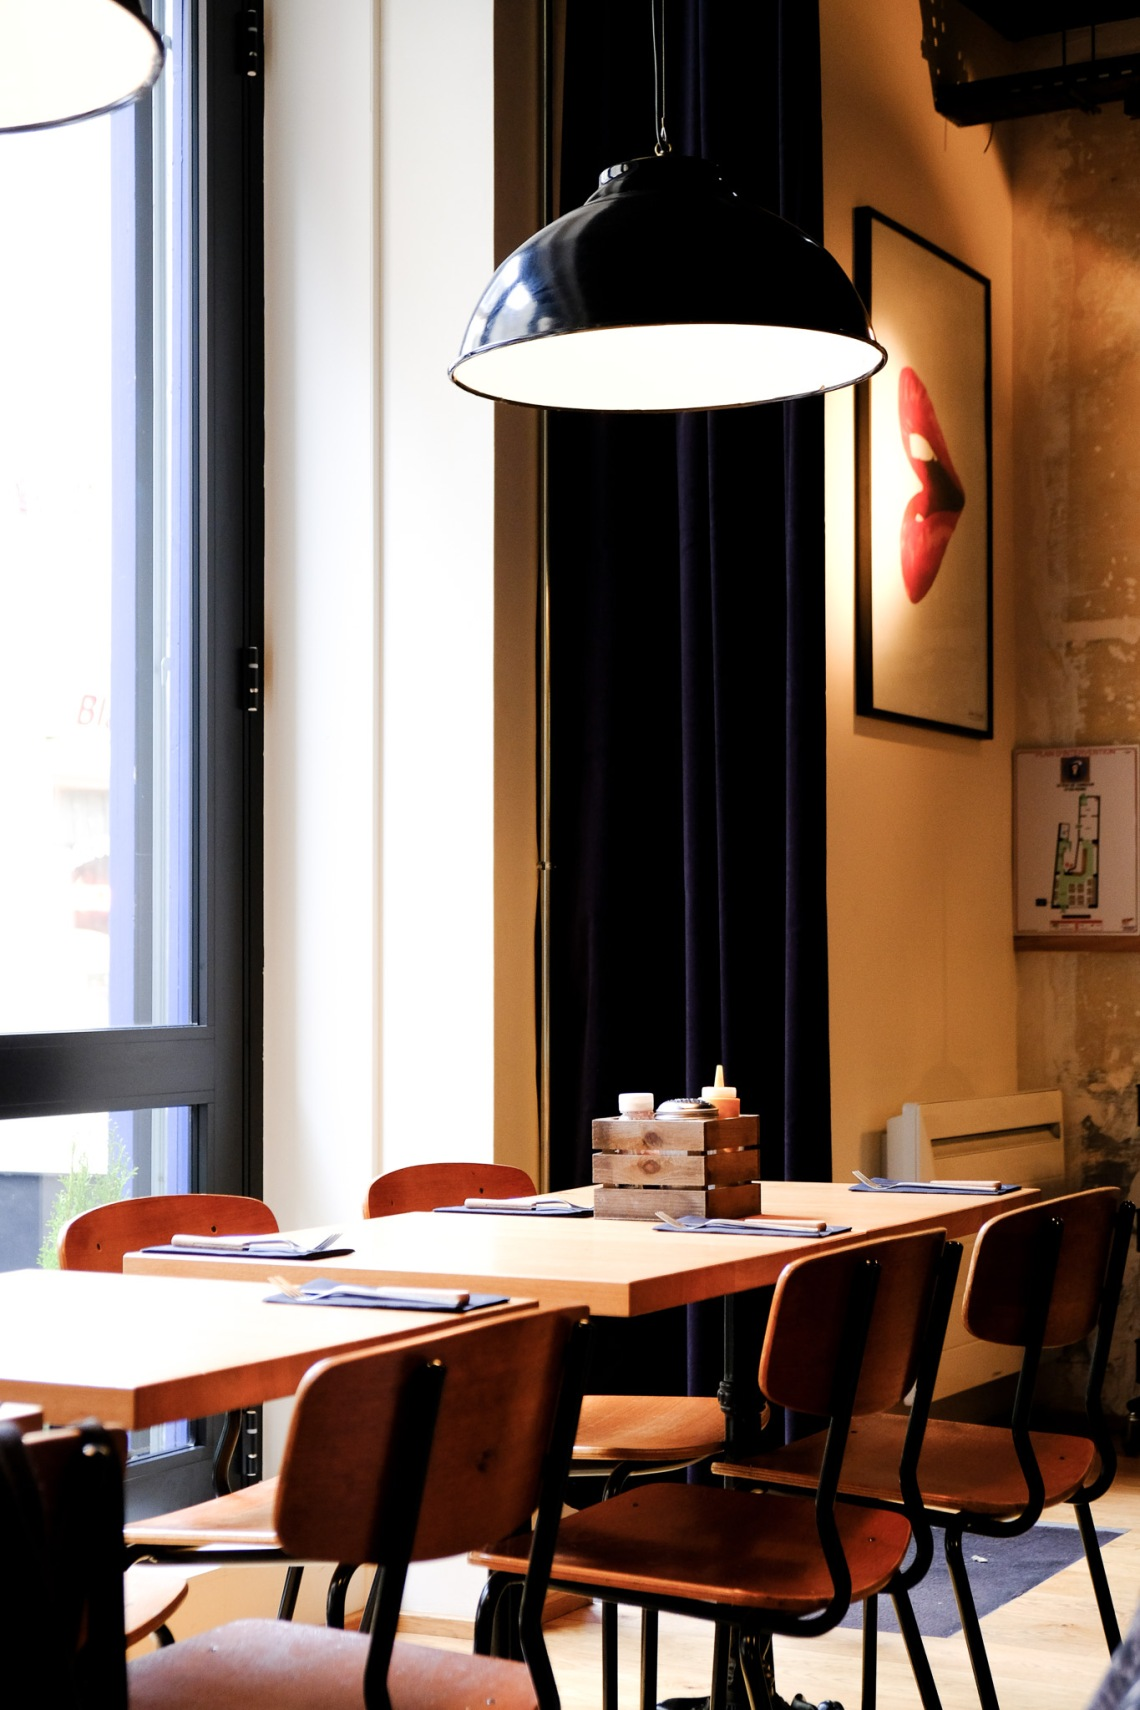 sacre-burger-restaurant-reims_01022018-DSCF7299